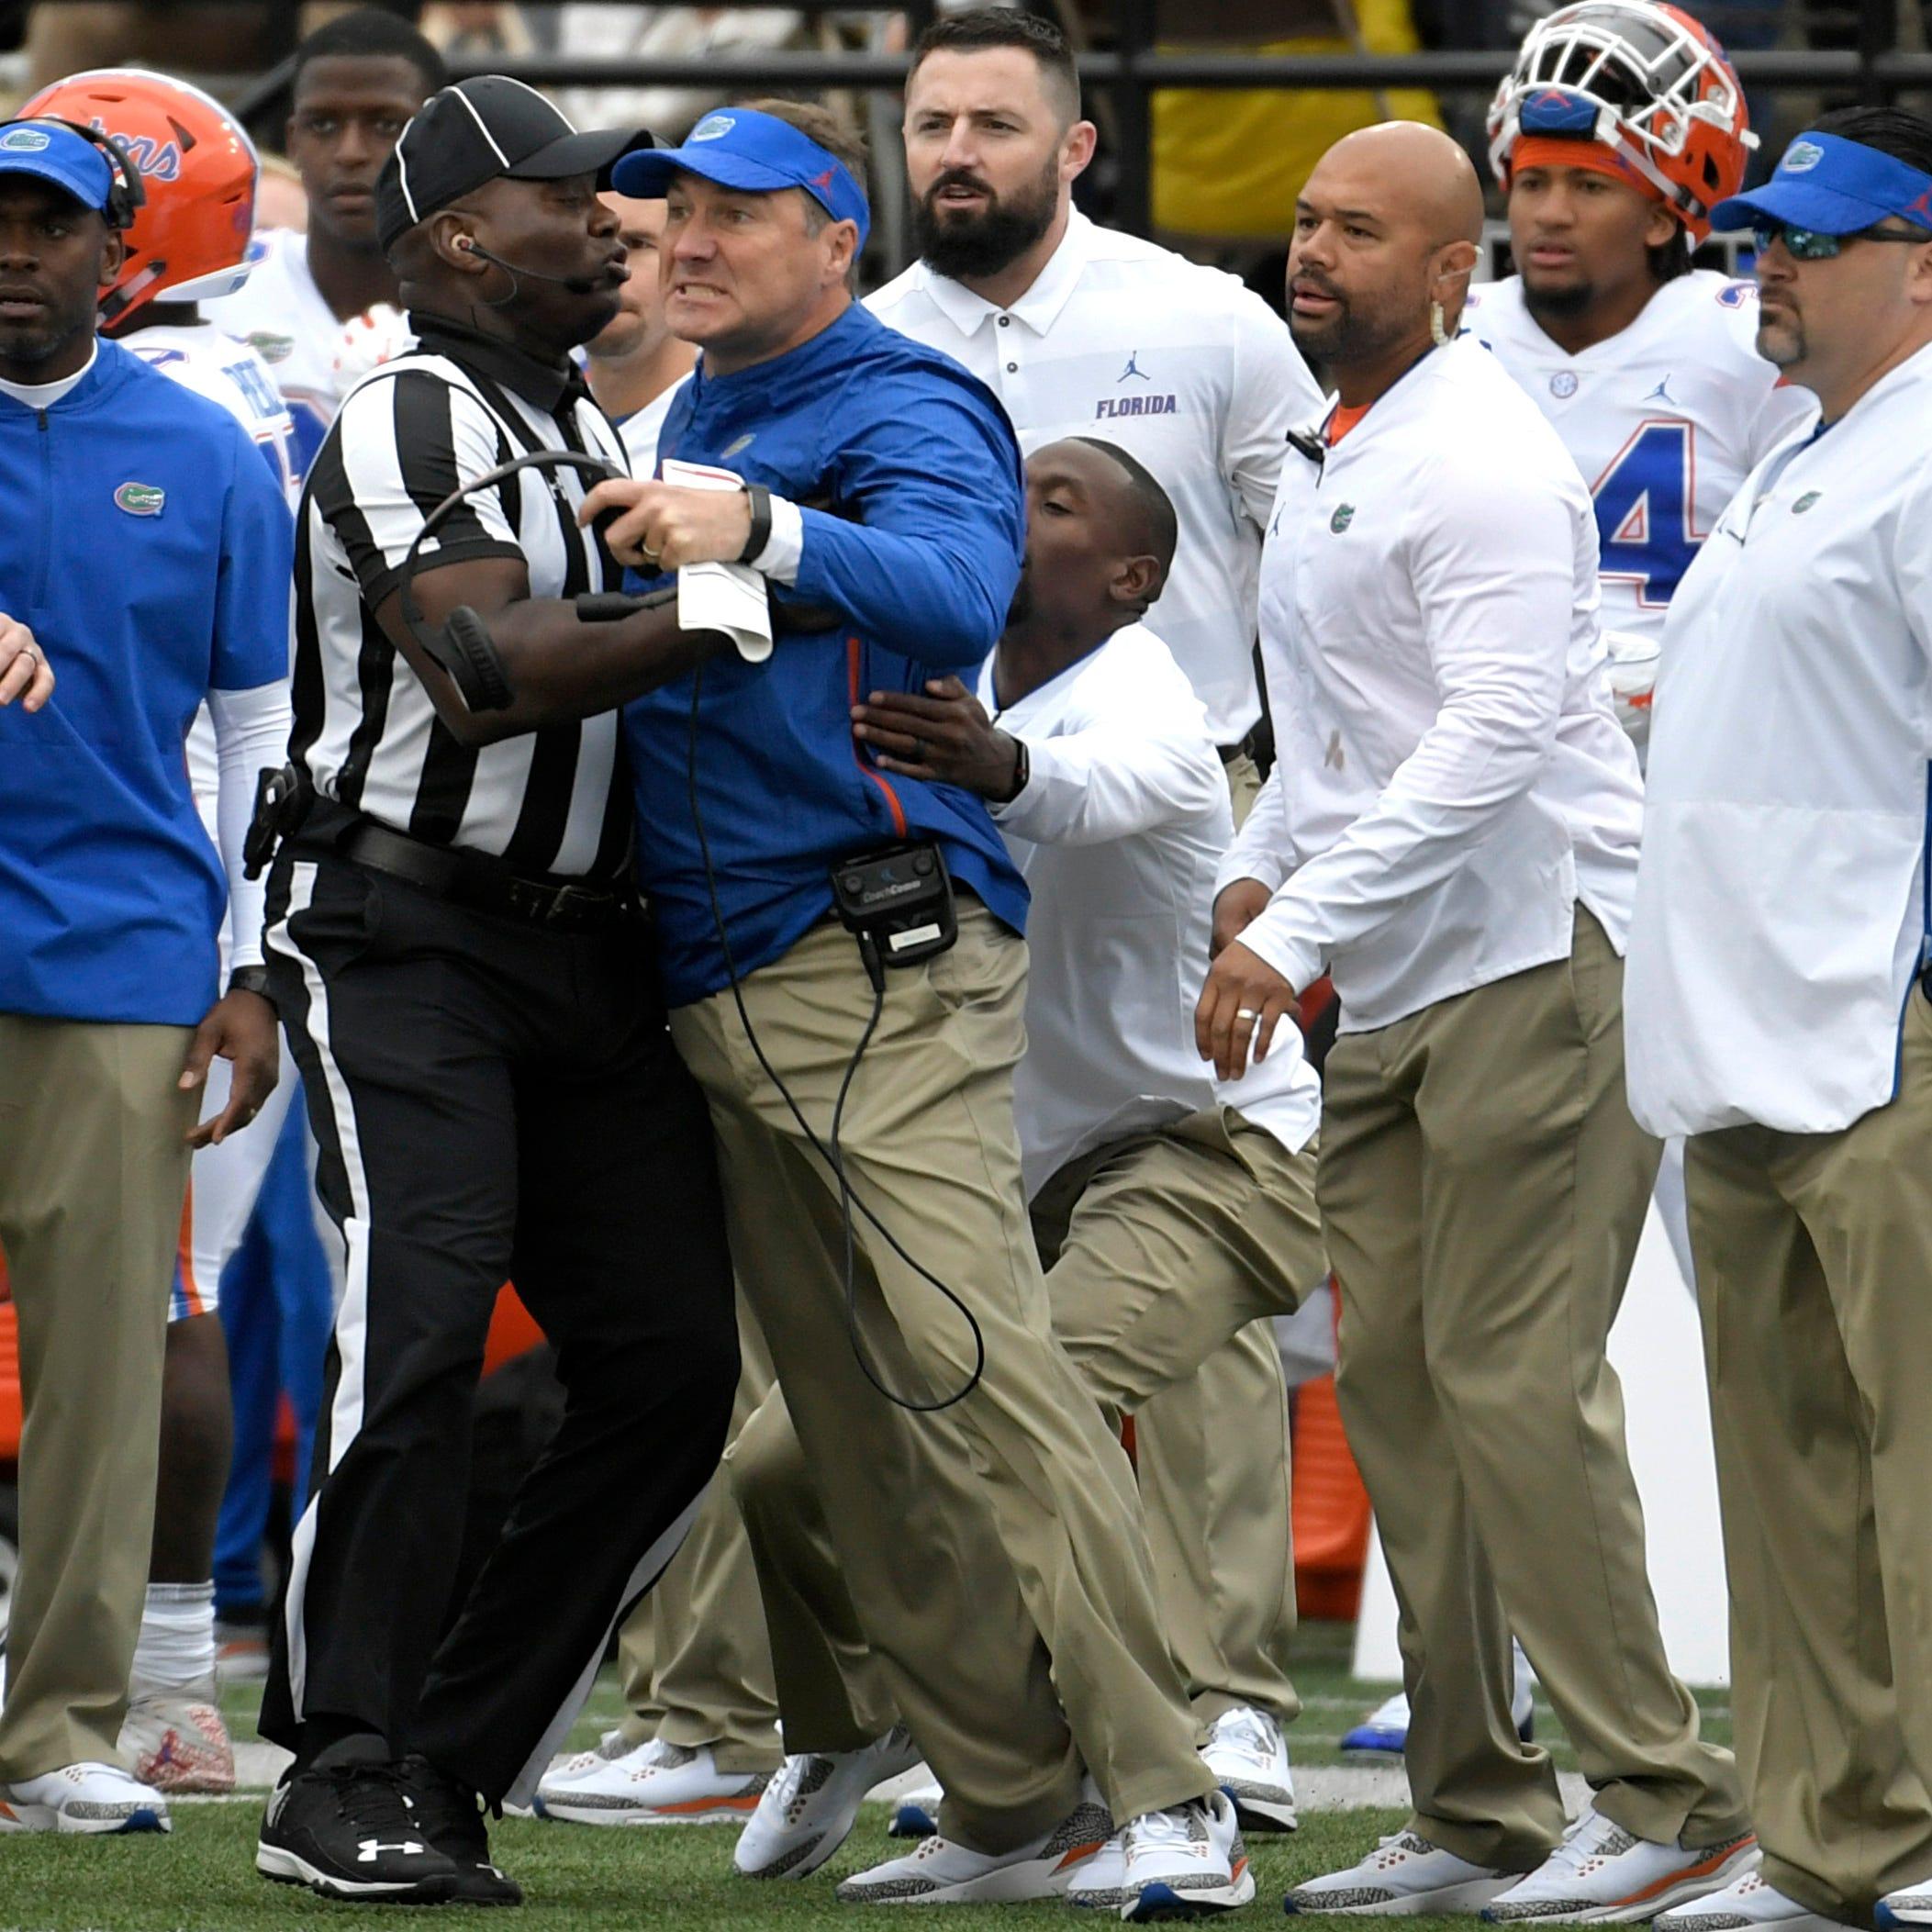 A dirty Florida hit, a near fight, another Vanderbilt football collapse in Nashville